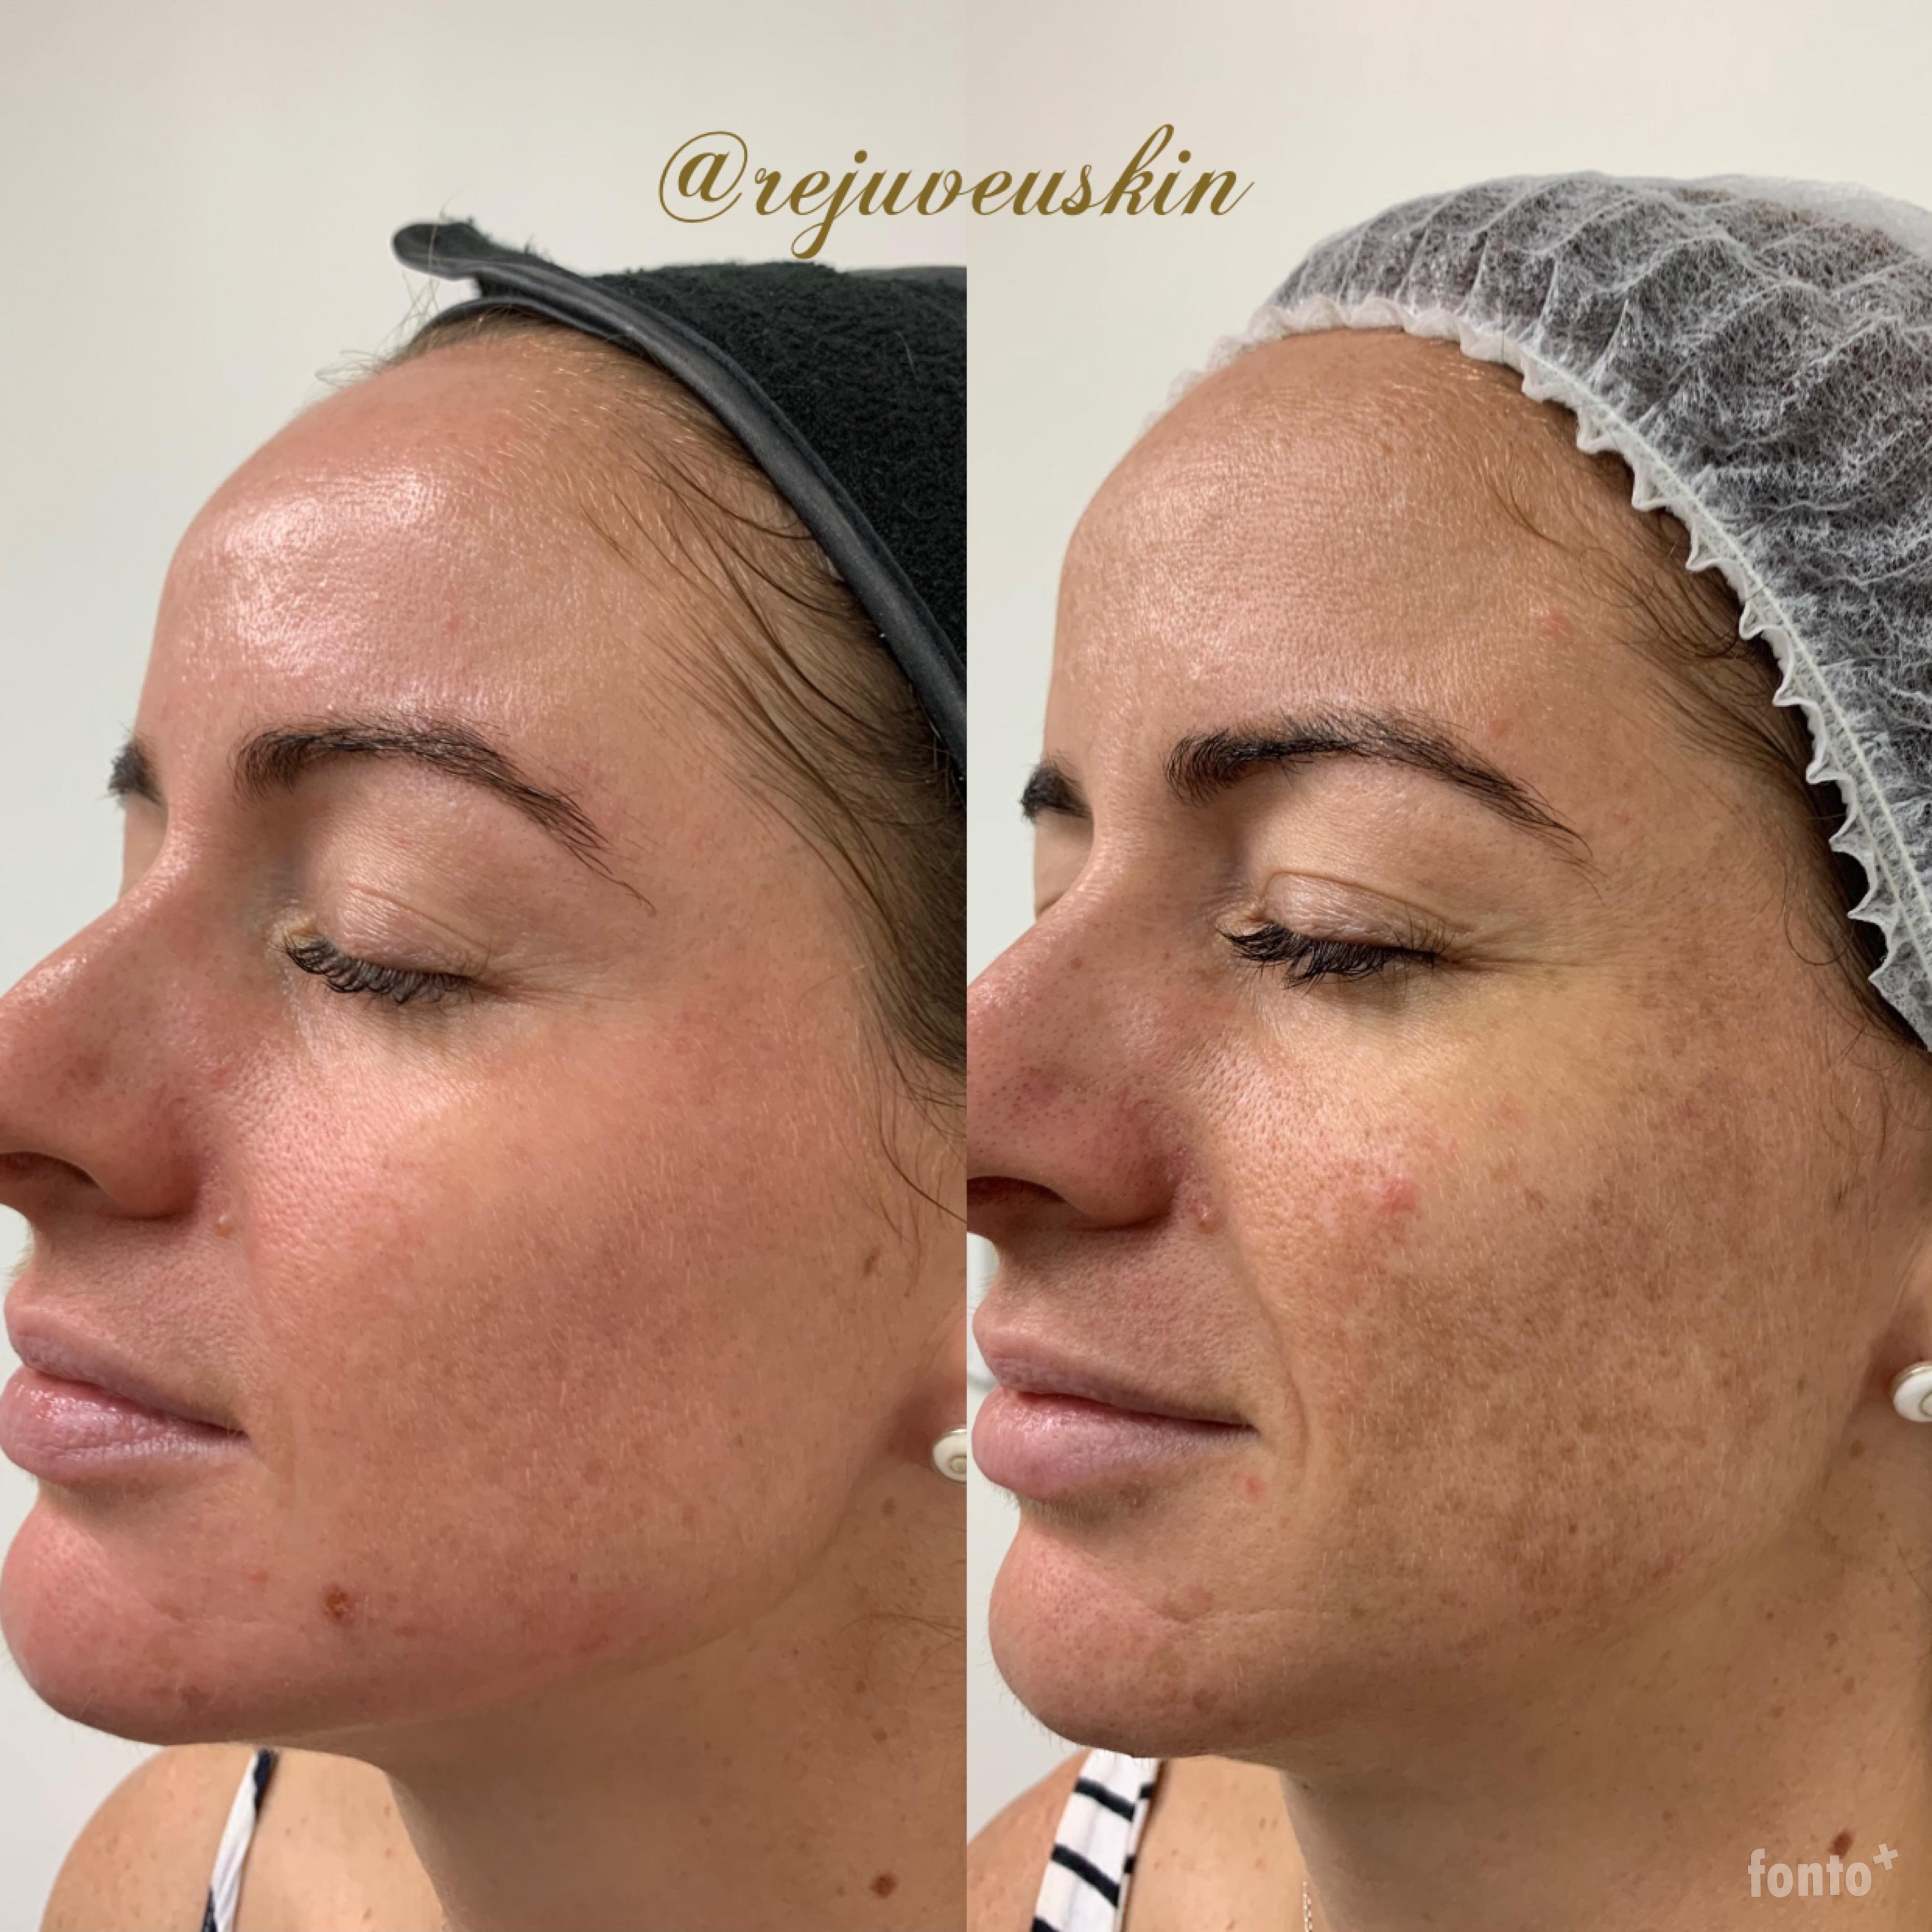 8 weeks into Cosmelan Depigmentation Method